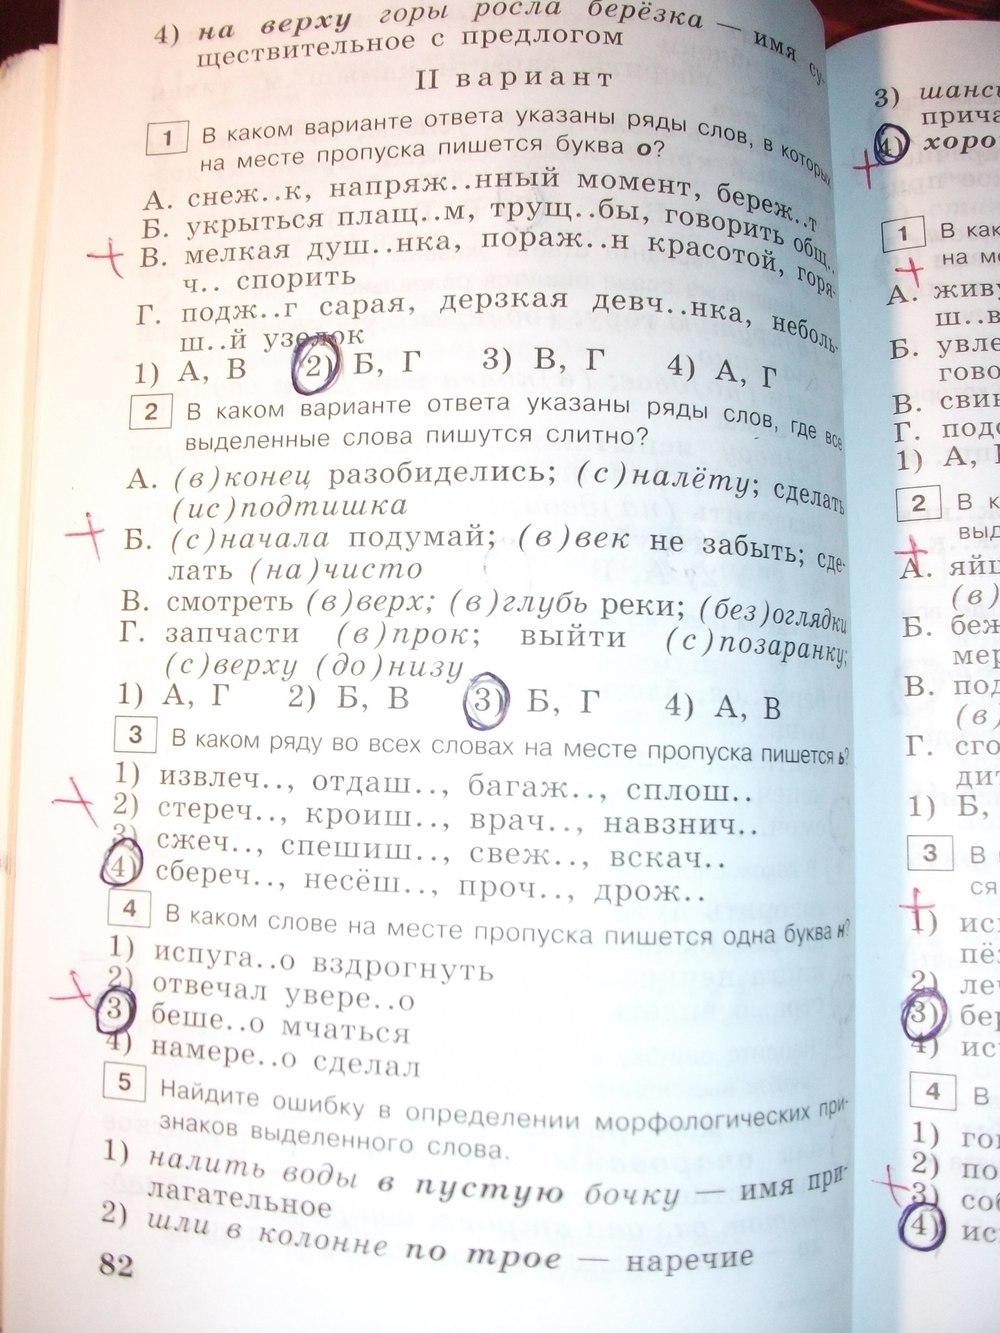 Гдз по русскому языку багданова 8 класс ответы на тест